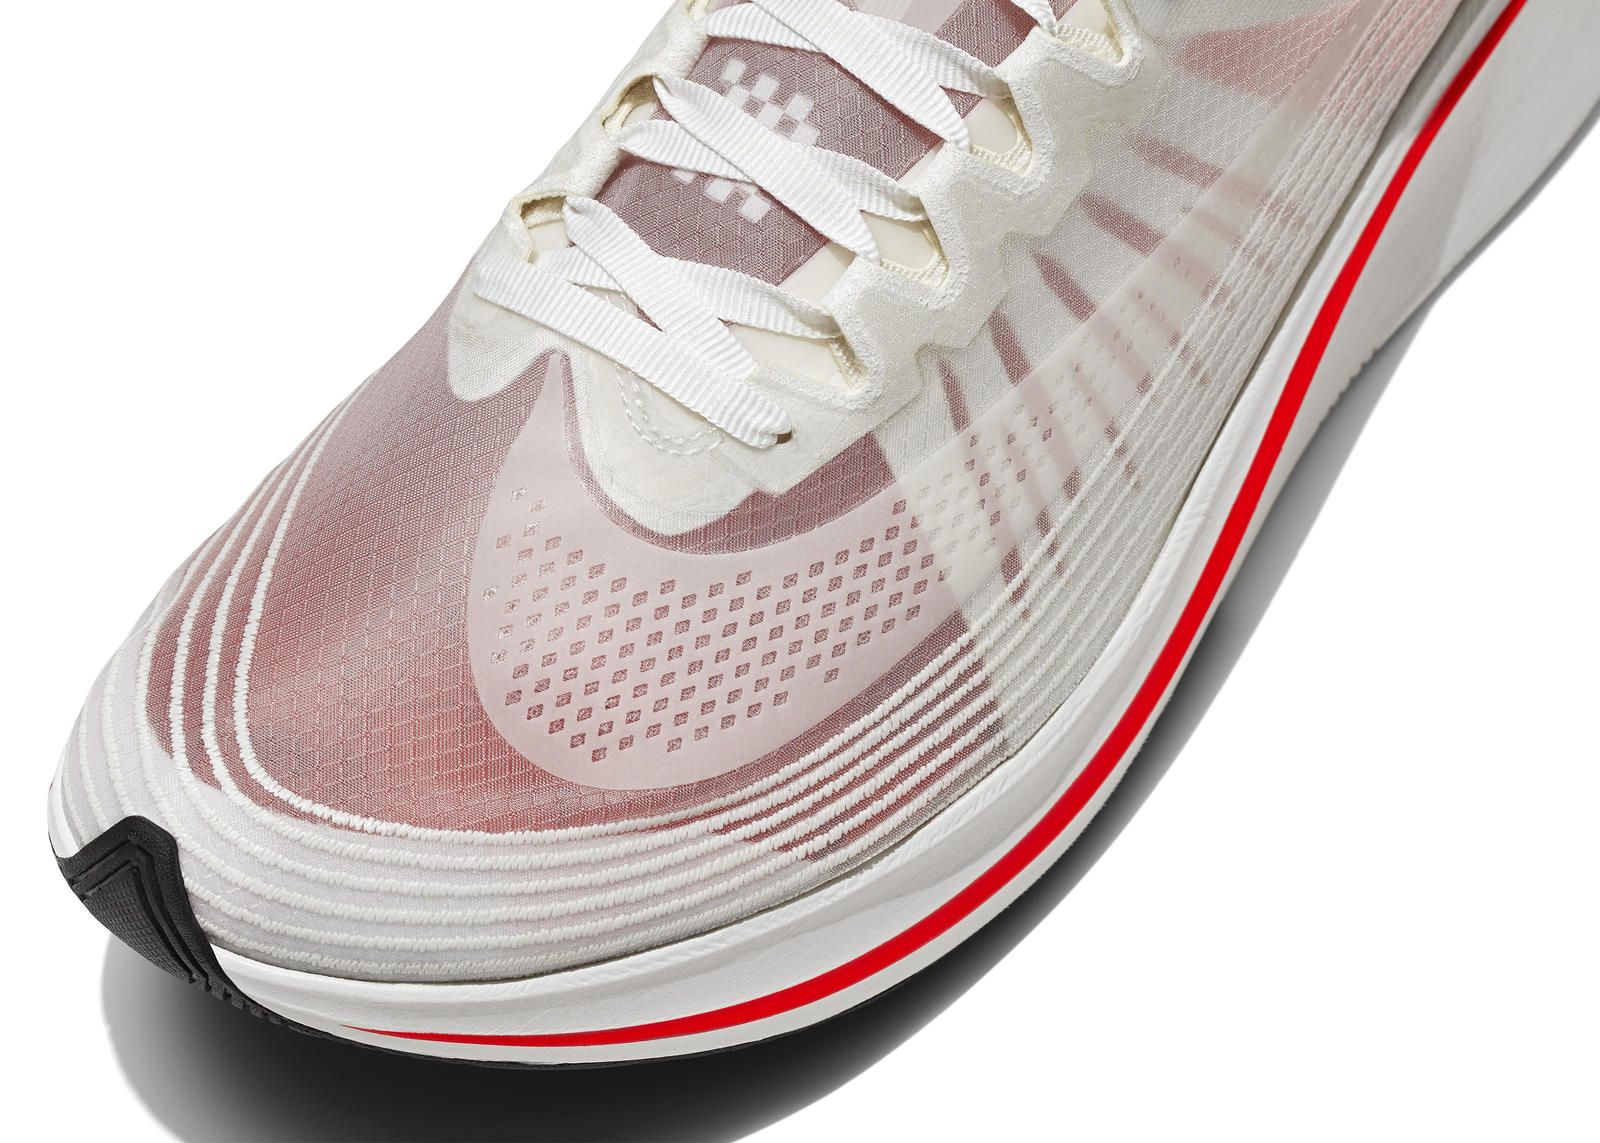 NikeLab-Zoom-VaporFly-SP-02